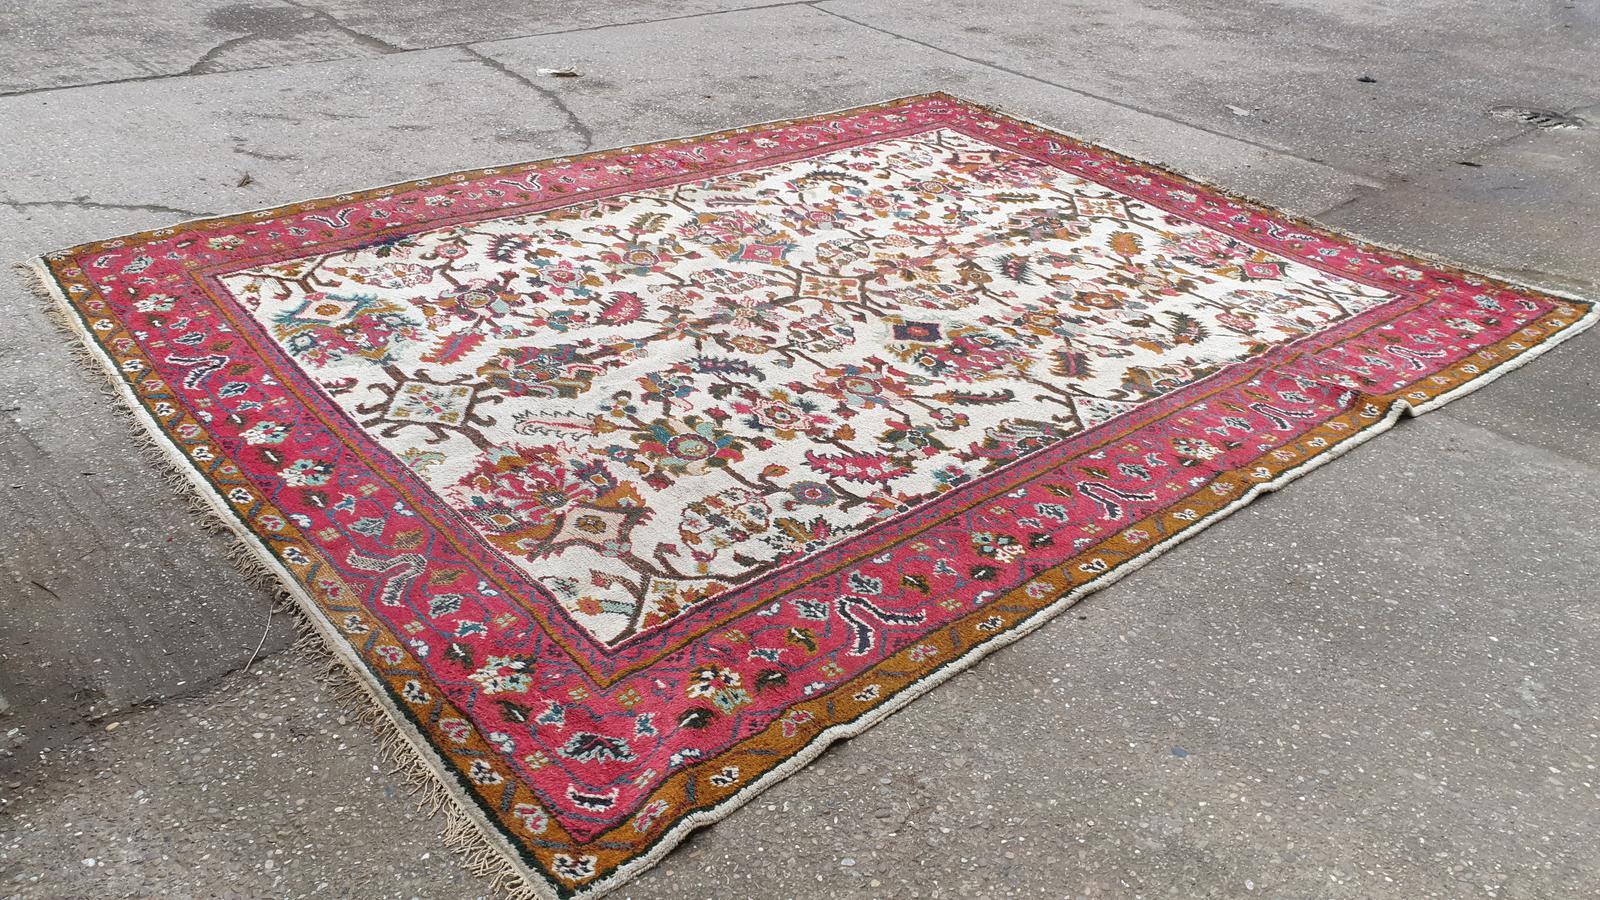 Large Woolen Carpet (1 of 1)